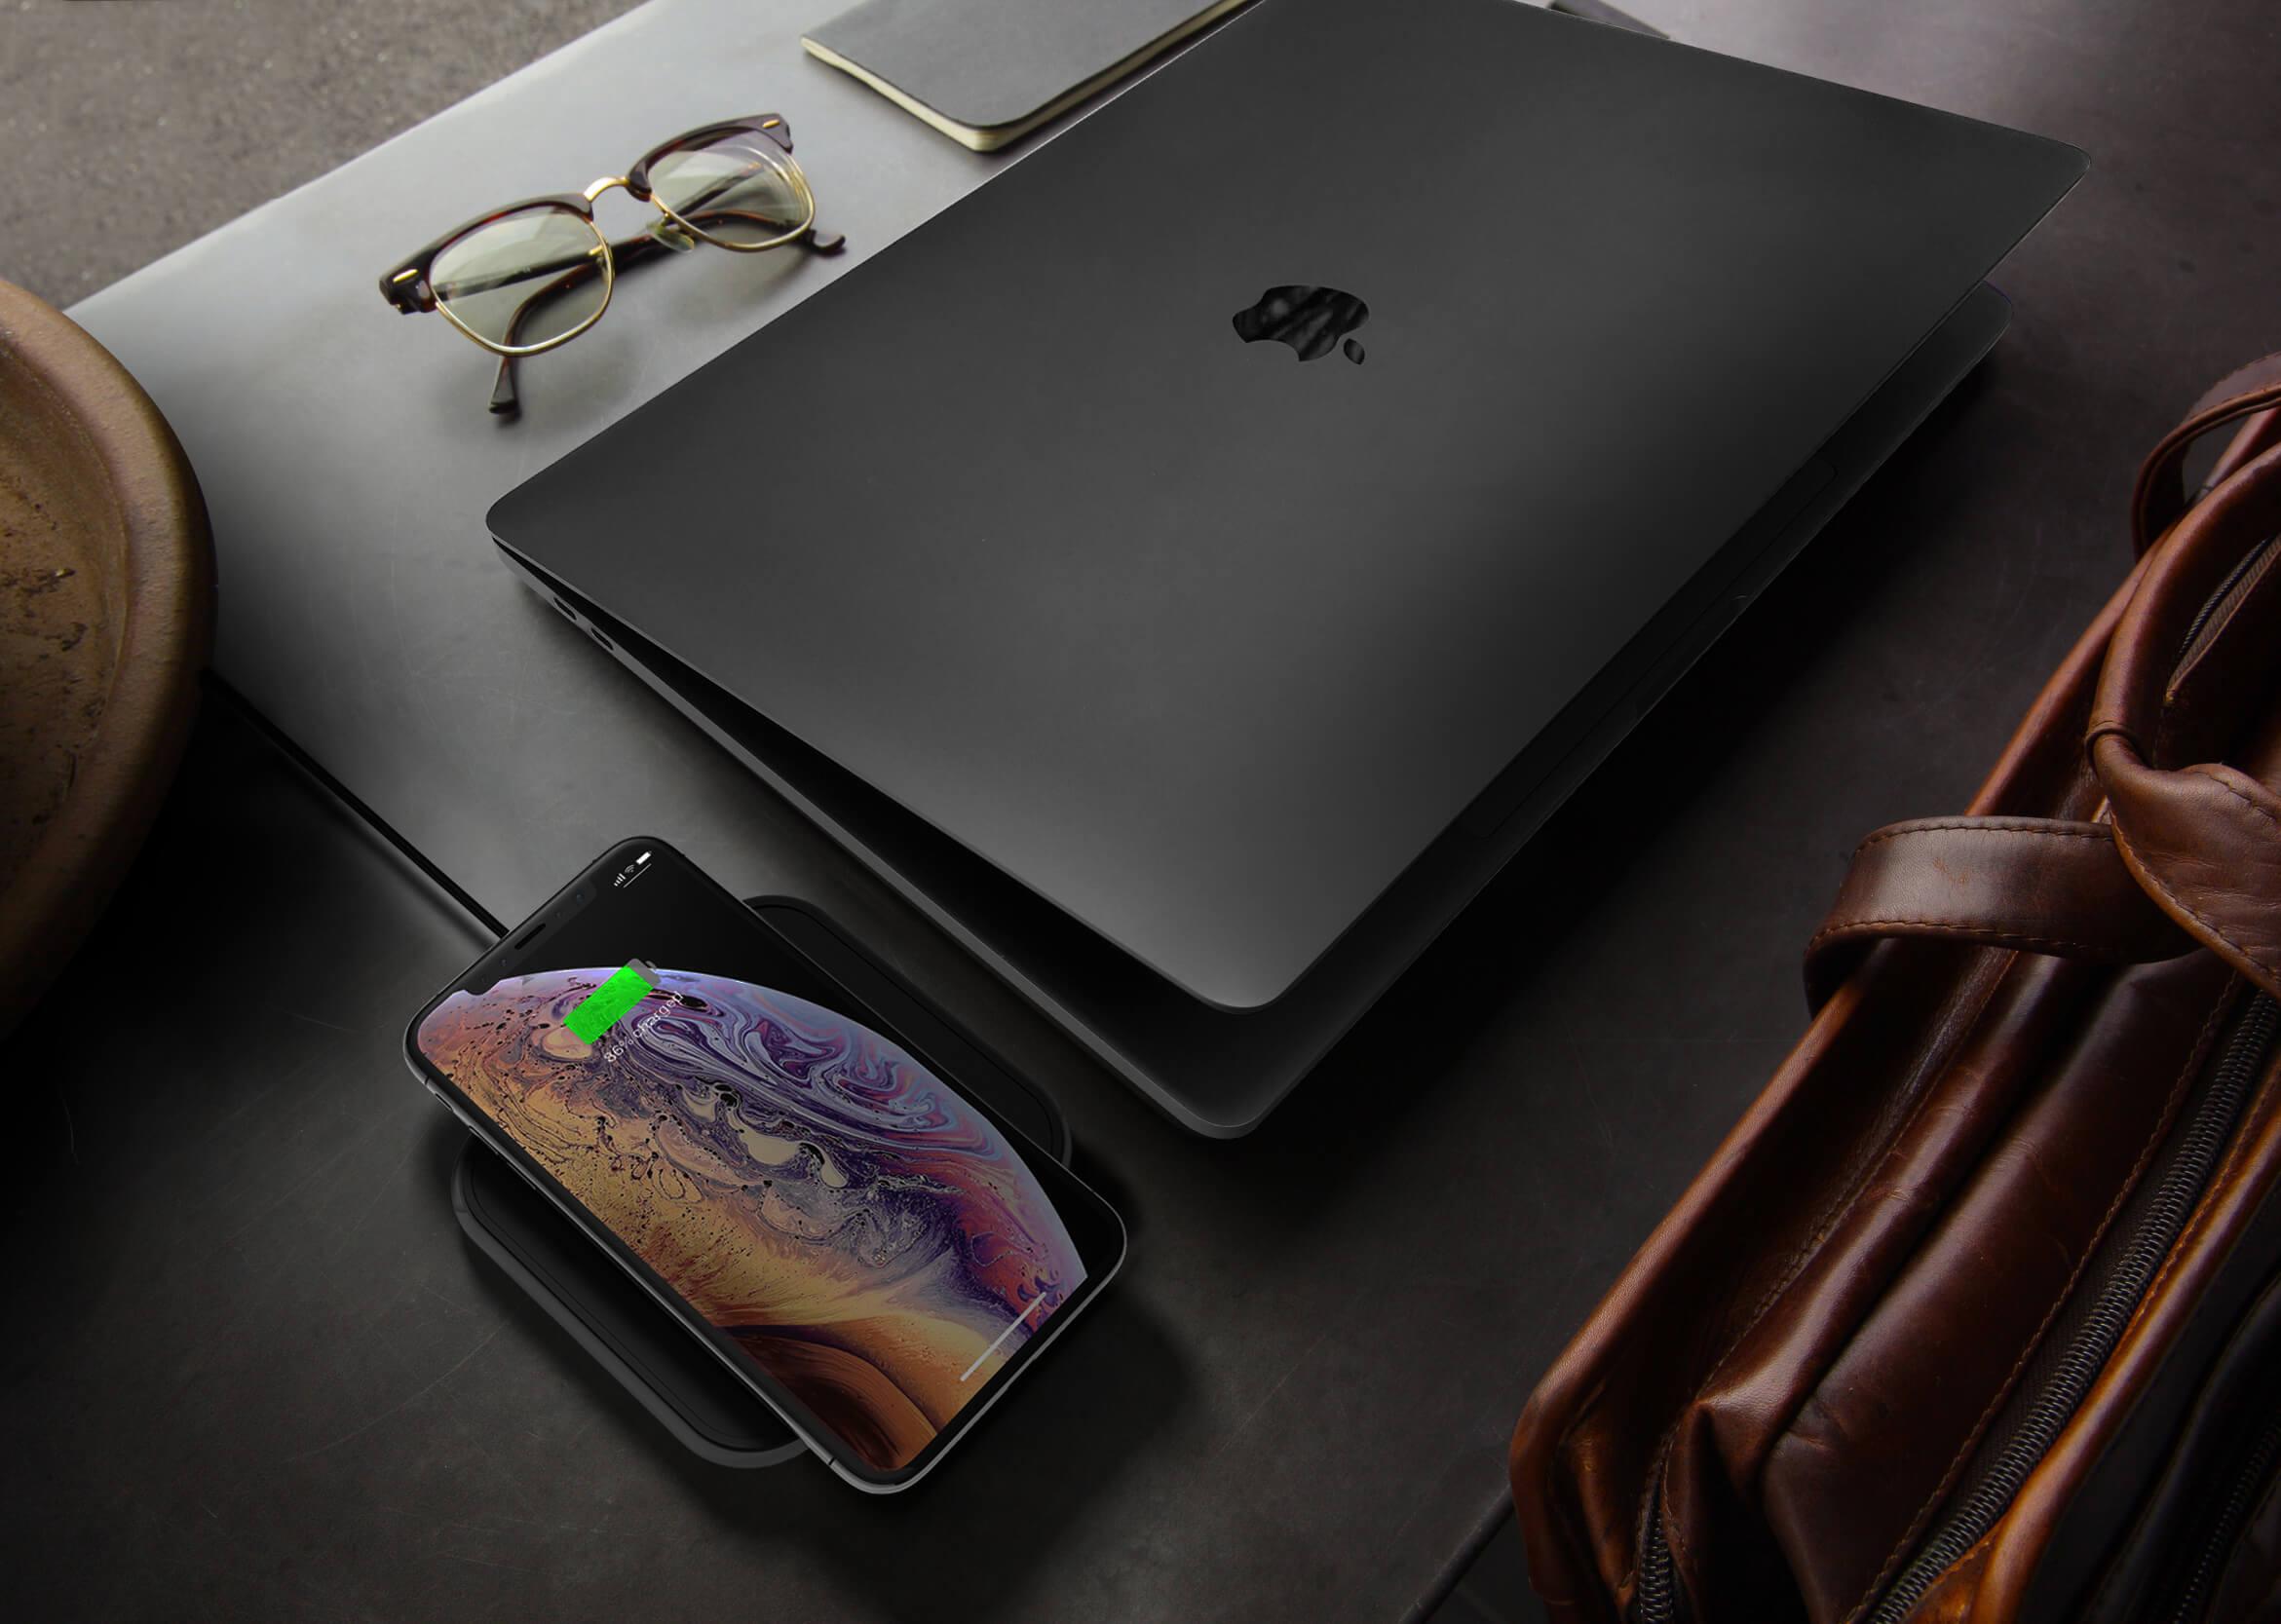 ZESC14B - Zens Single Aluminium Wireless Charger Lifestyle Image Business